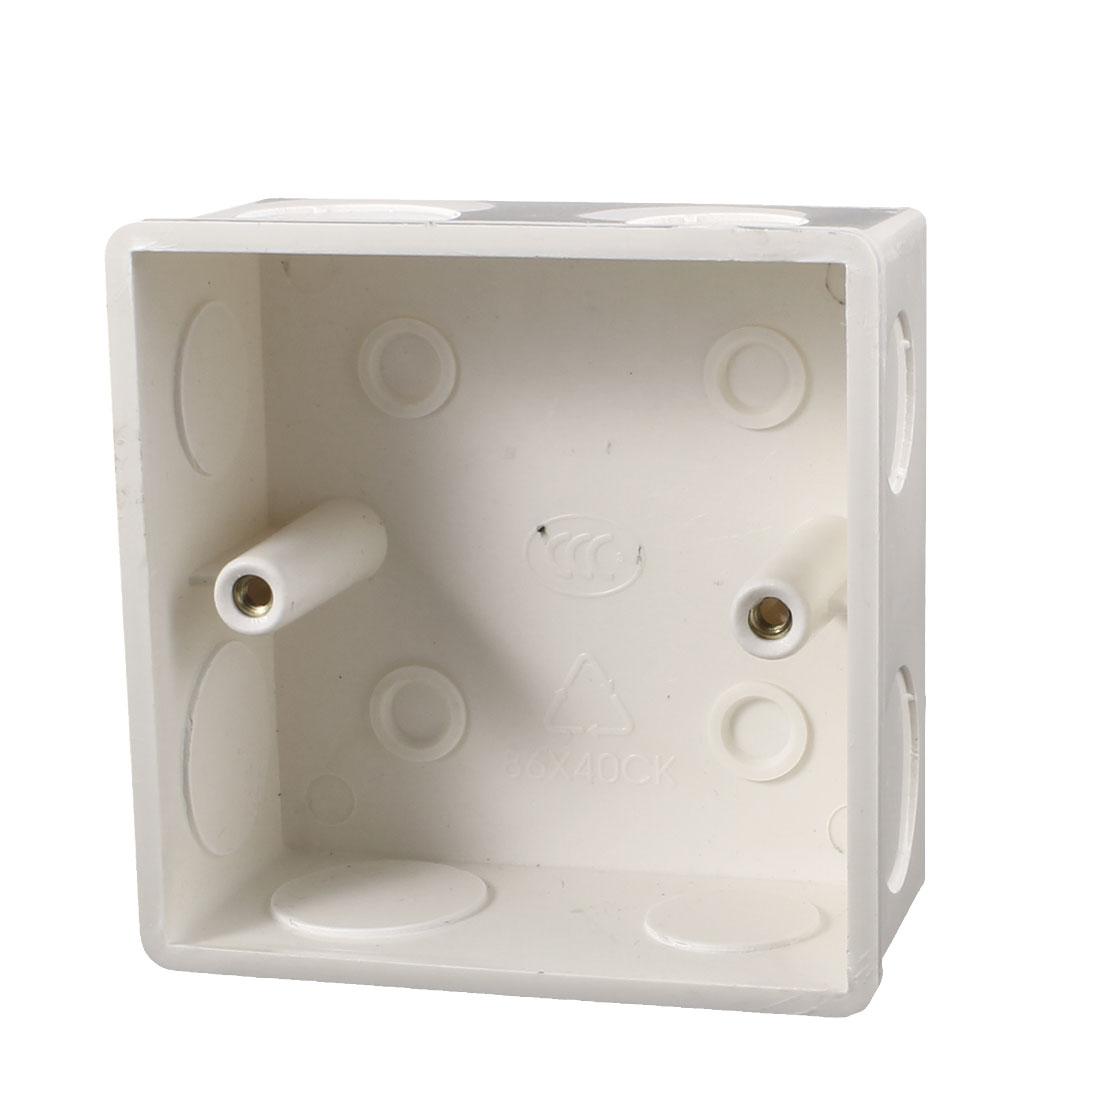 86mm x 86mm x 40mm White Plastic Dual Sockets Mount Back Box for Wall Socket